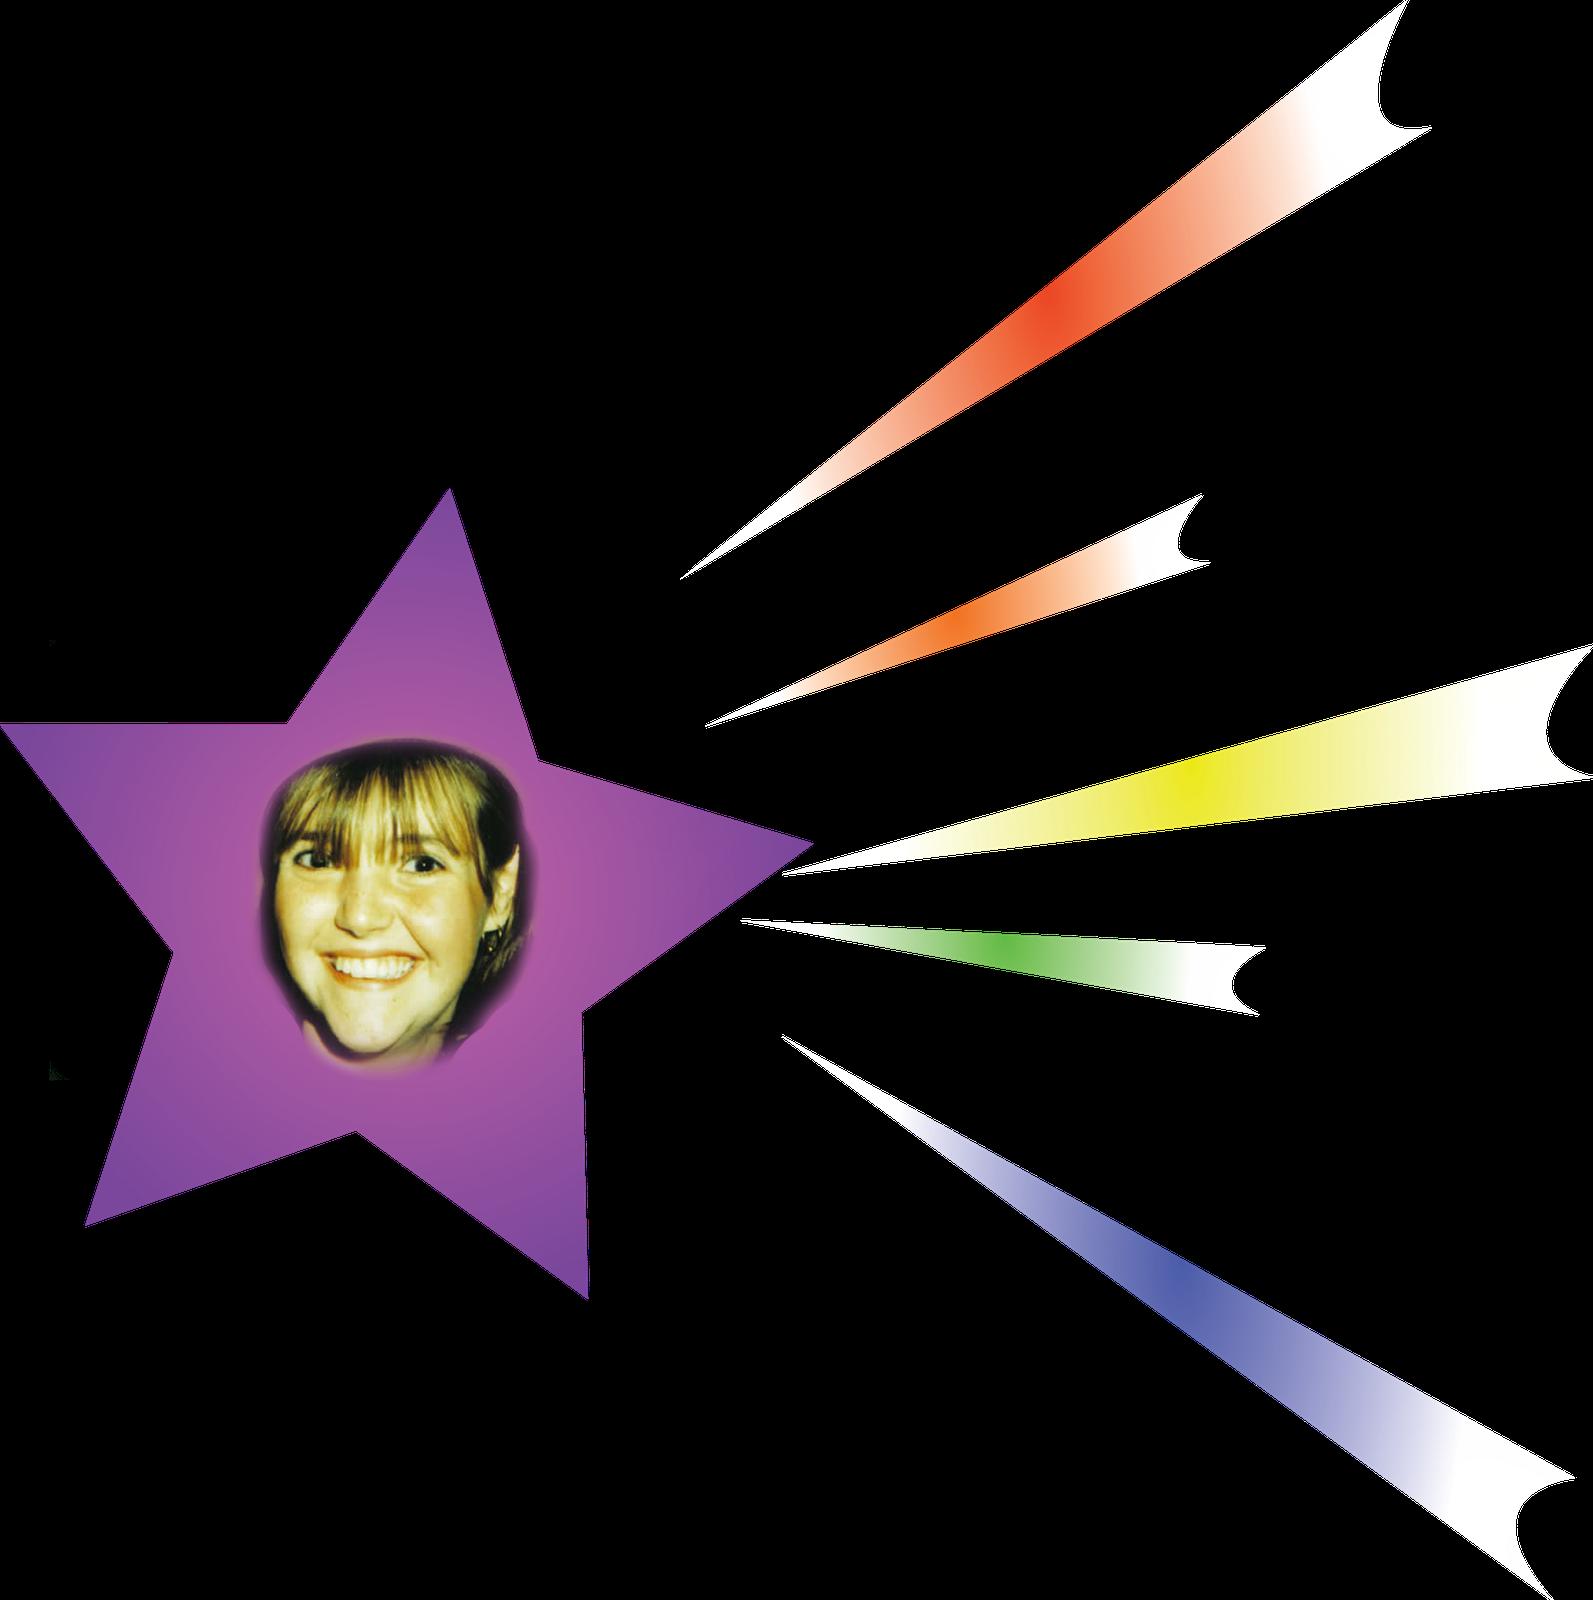 Rocket shooting star clipart 3